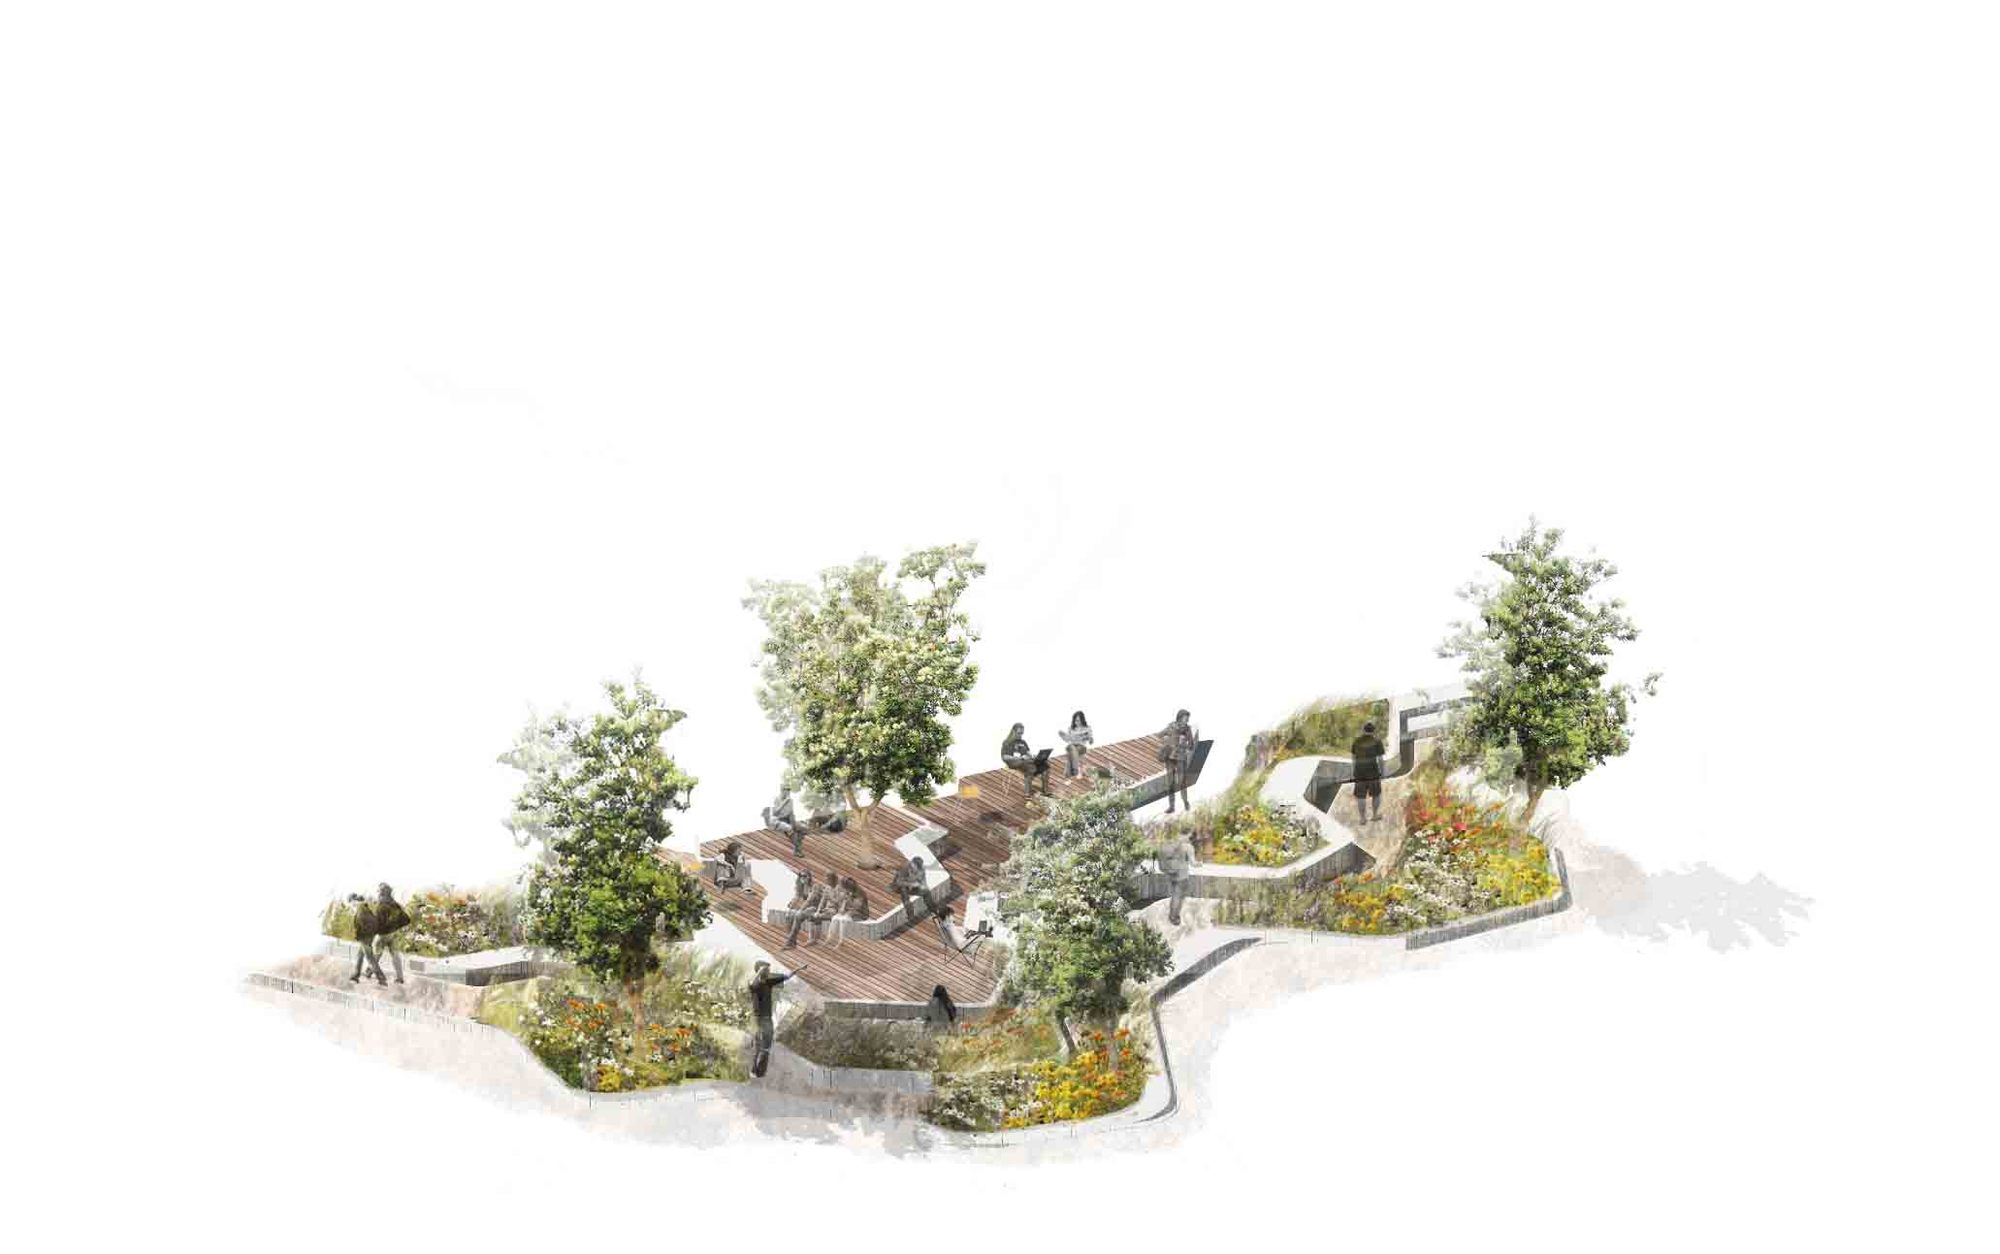 La aspect studios on pinterest hill garden sydney and for Aspect studios